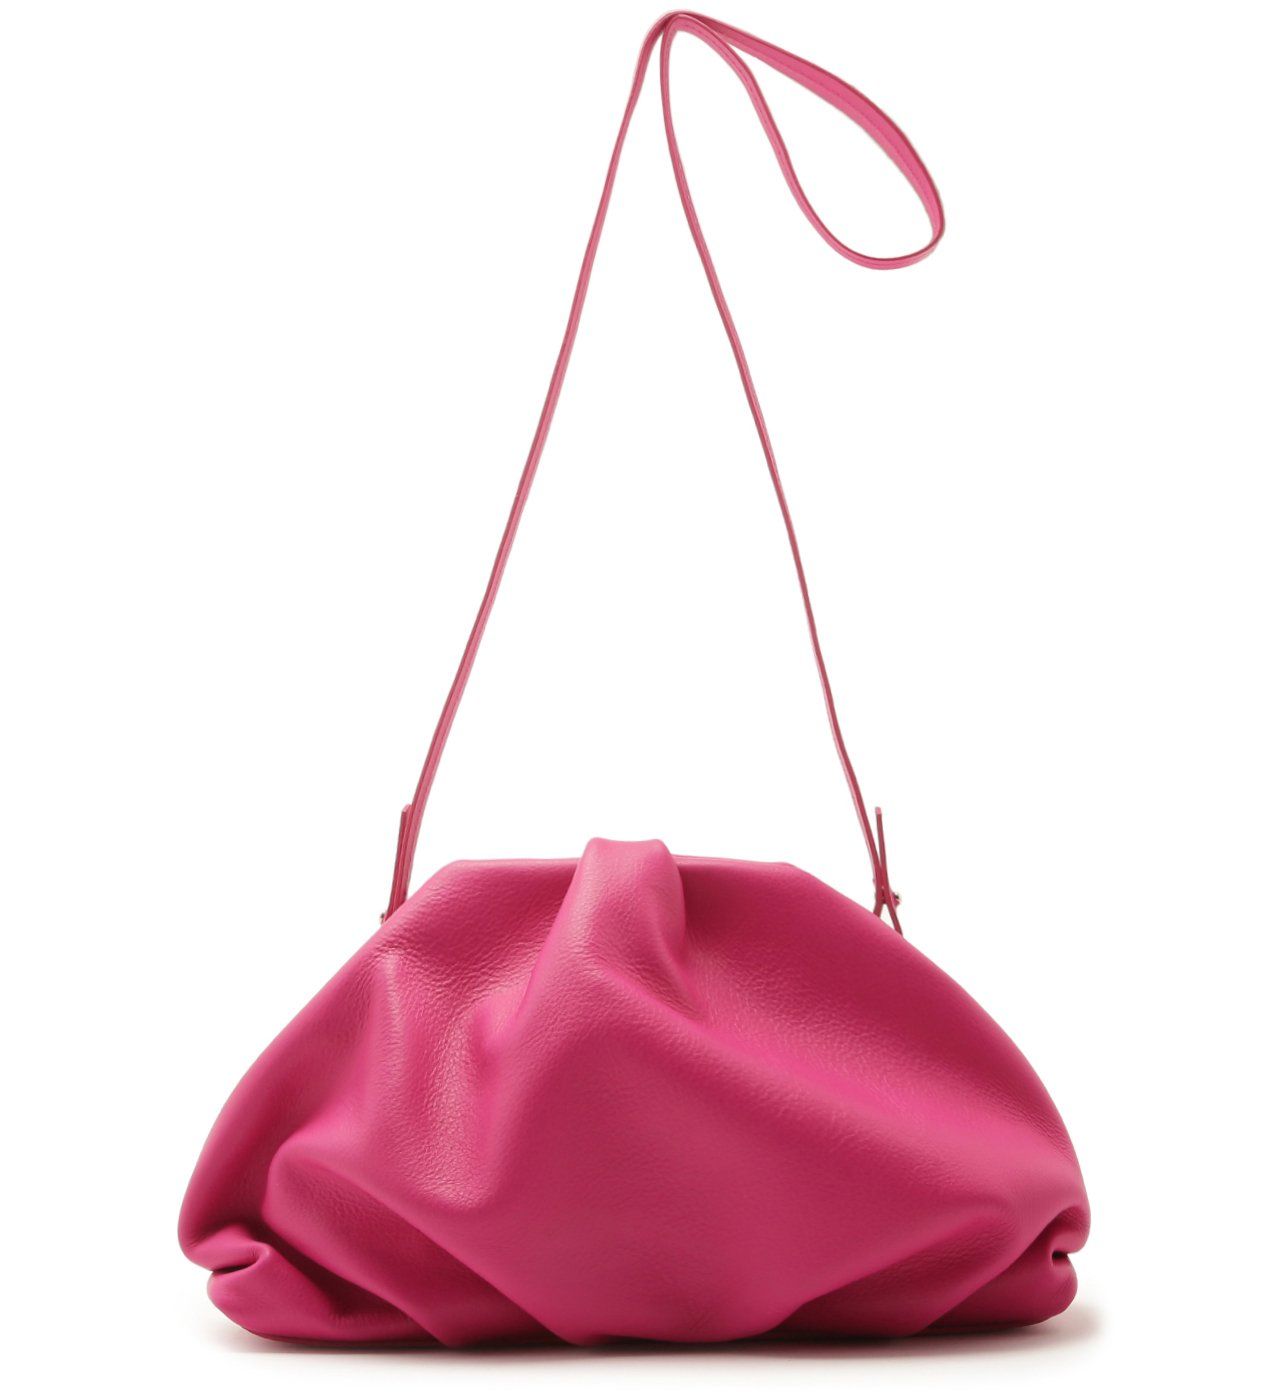 Clutch Avril Leather Pink | Schutz